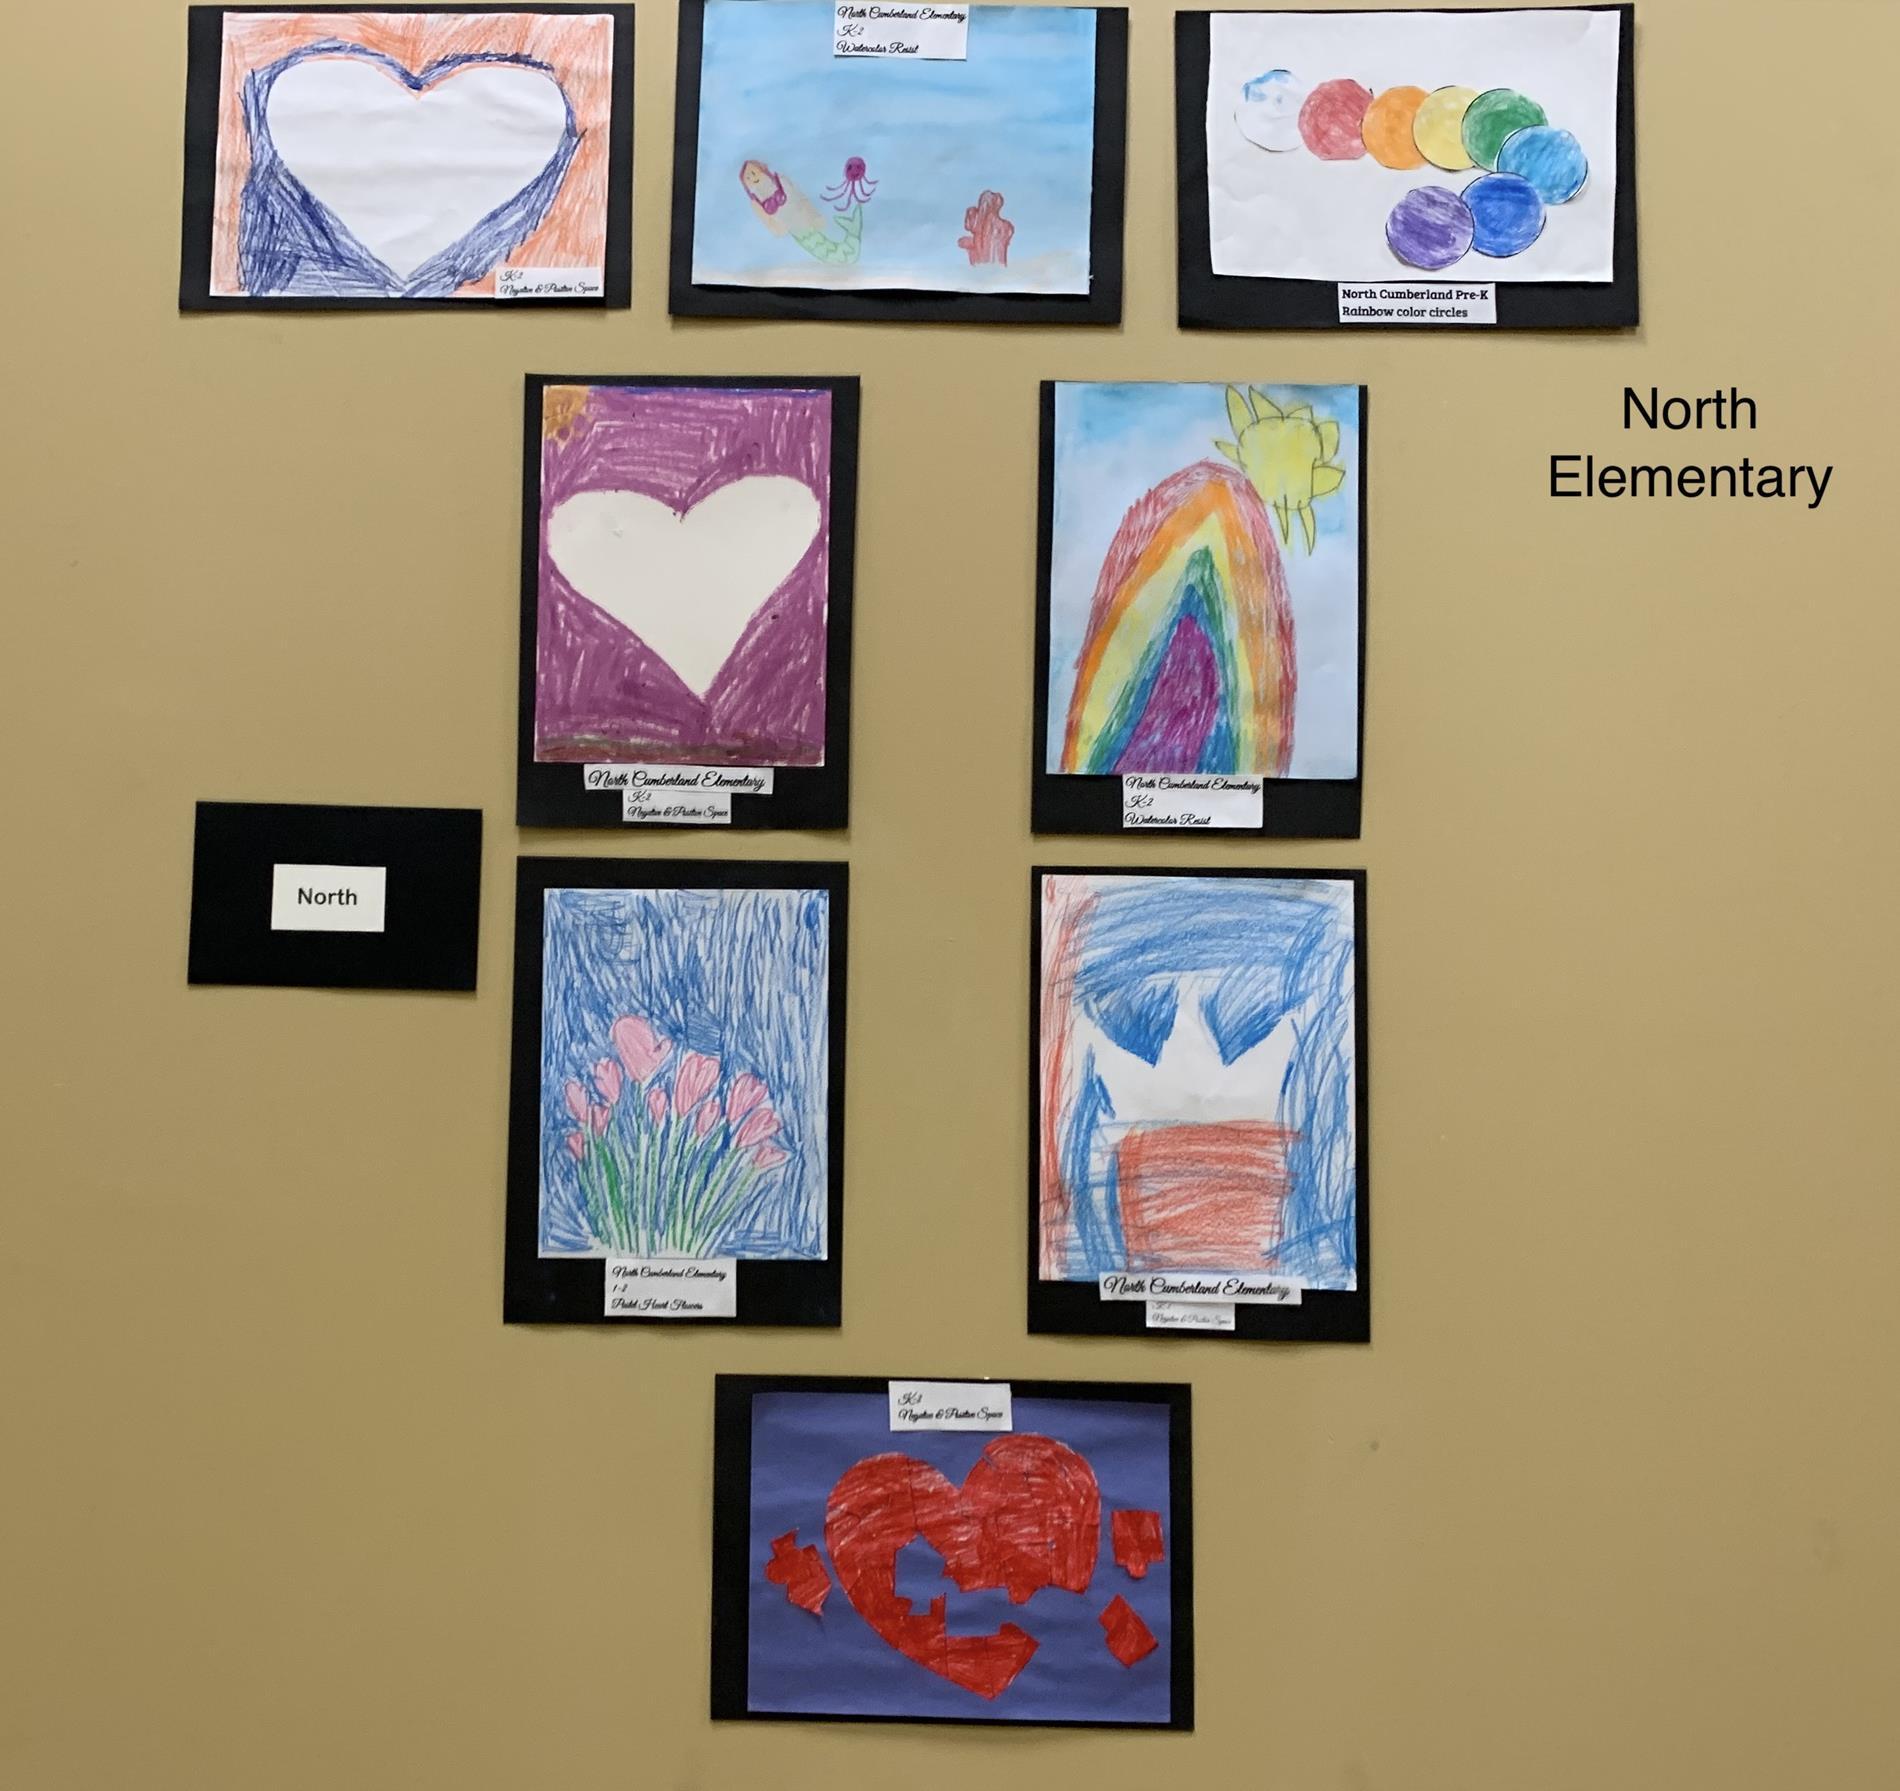 North Elementary Art Work